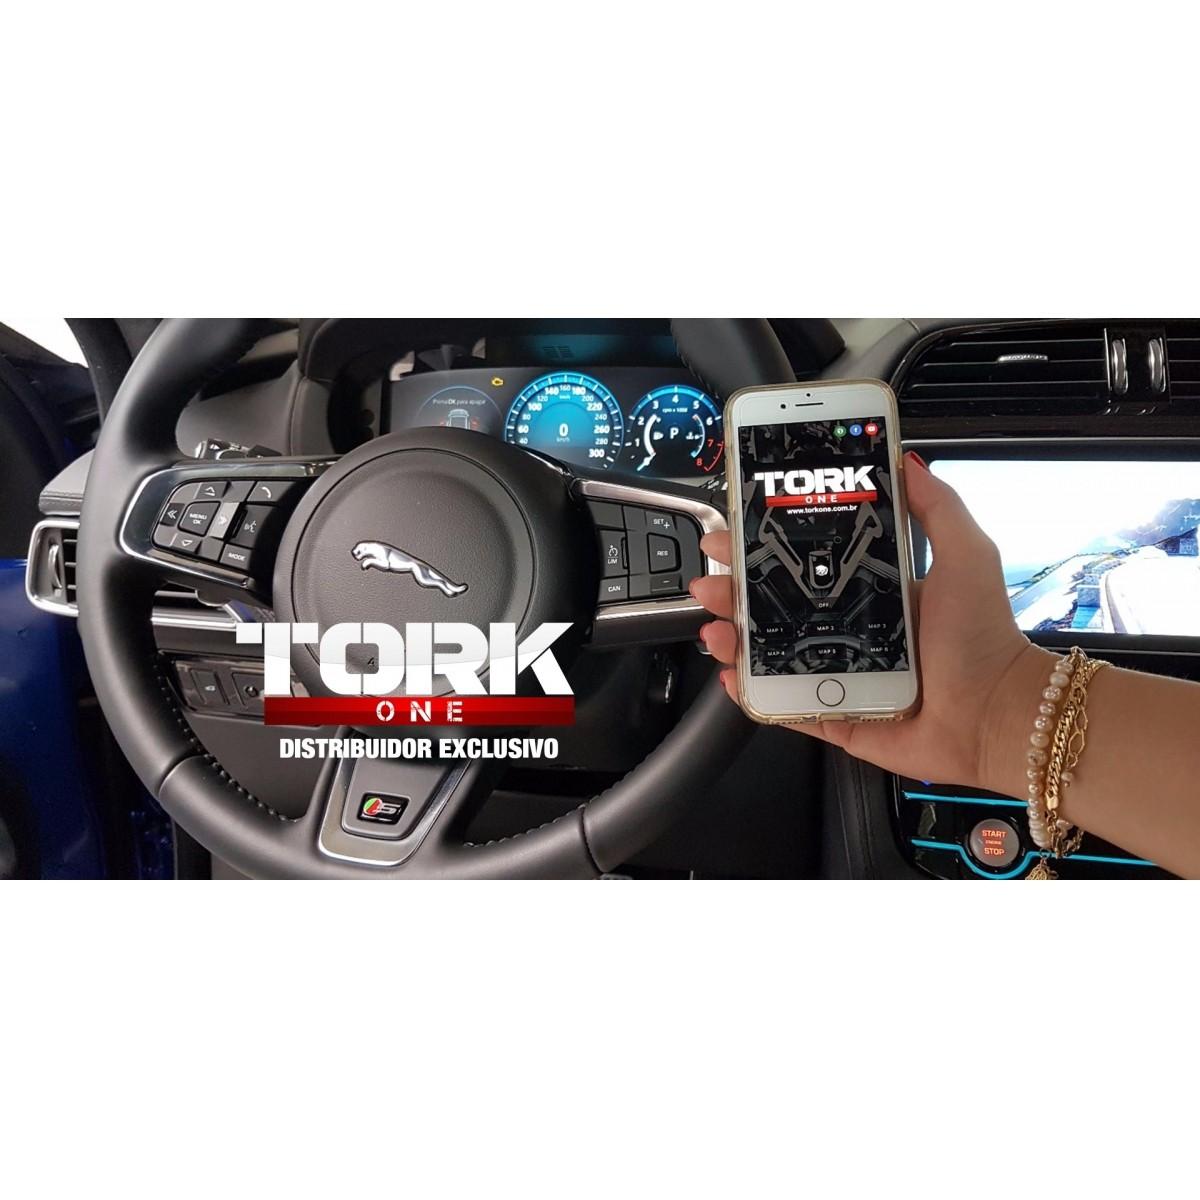 Gás Pedal - Fiat - Tork One c/s Bluetooth